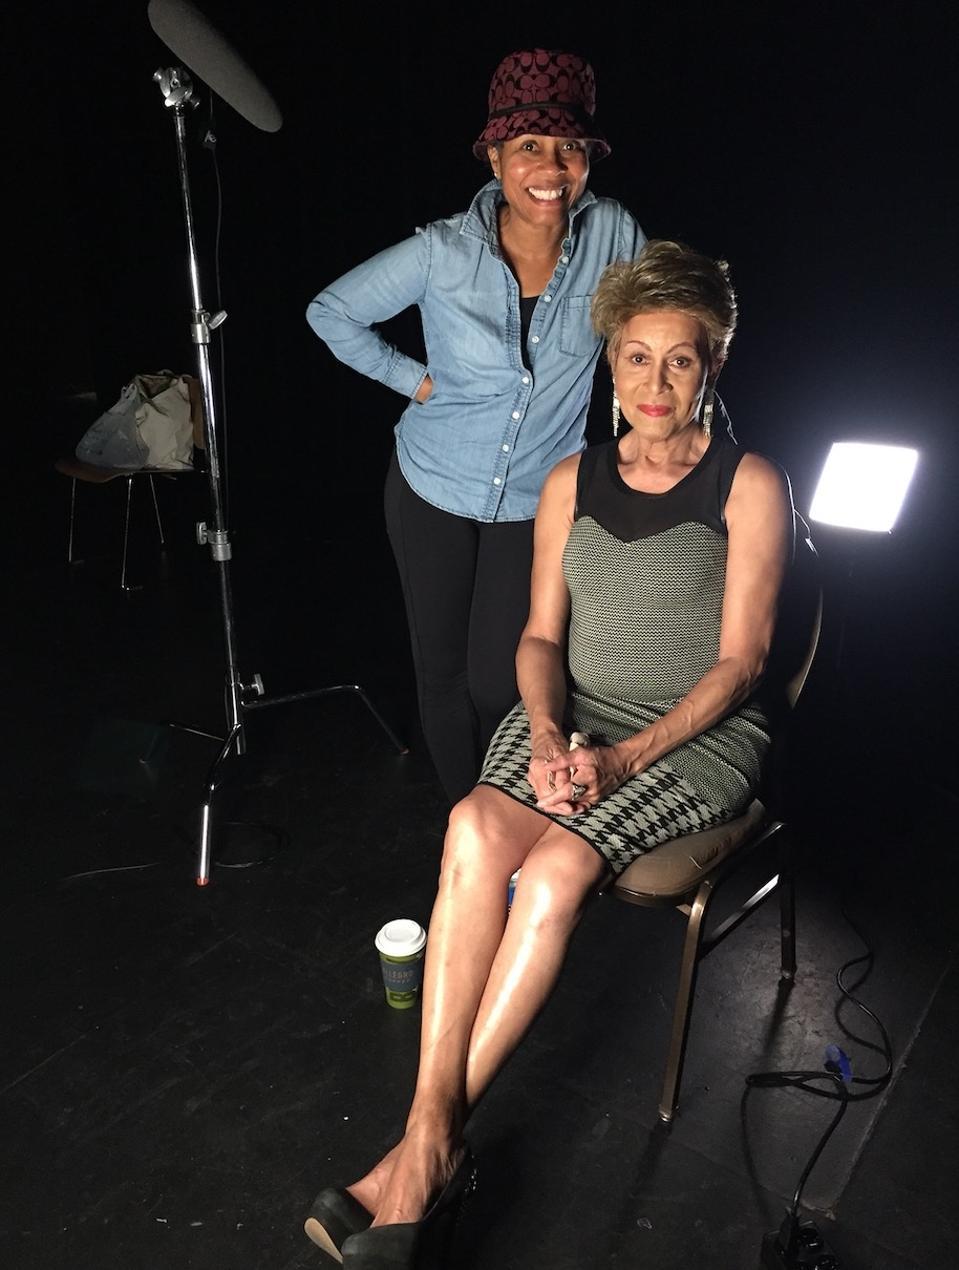 Luchina Fisher (standing) and Gloria Allen